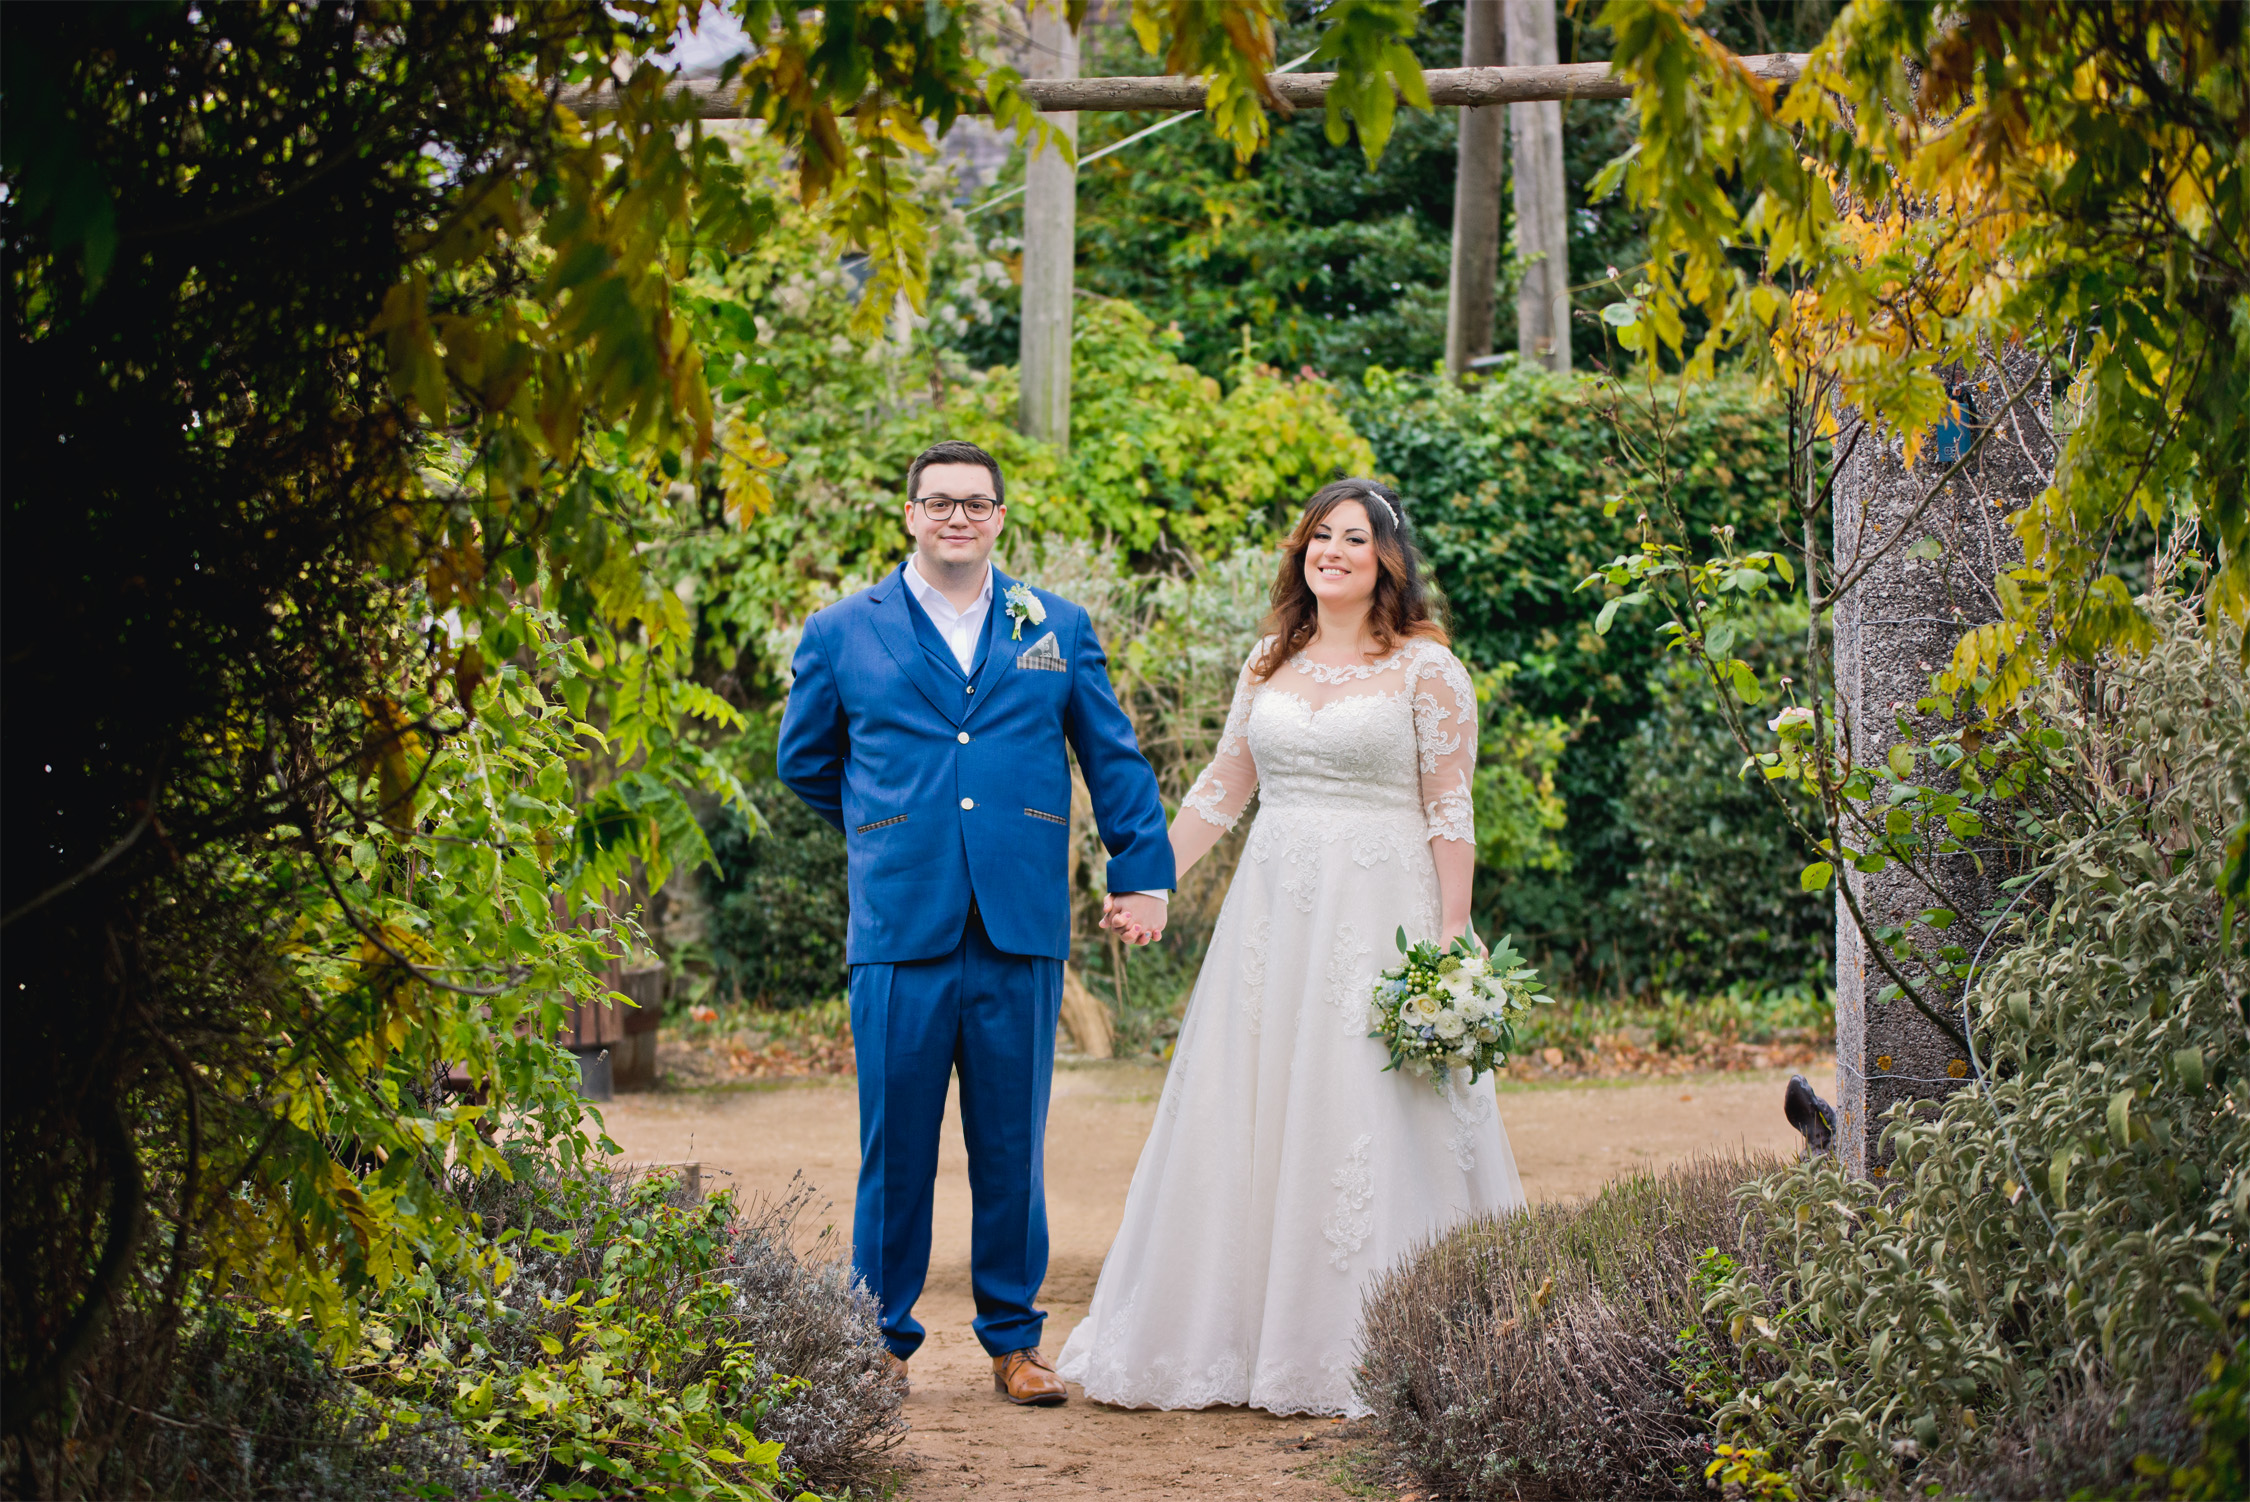 Happy couple wedding garden photo retouching